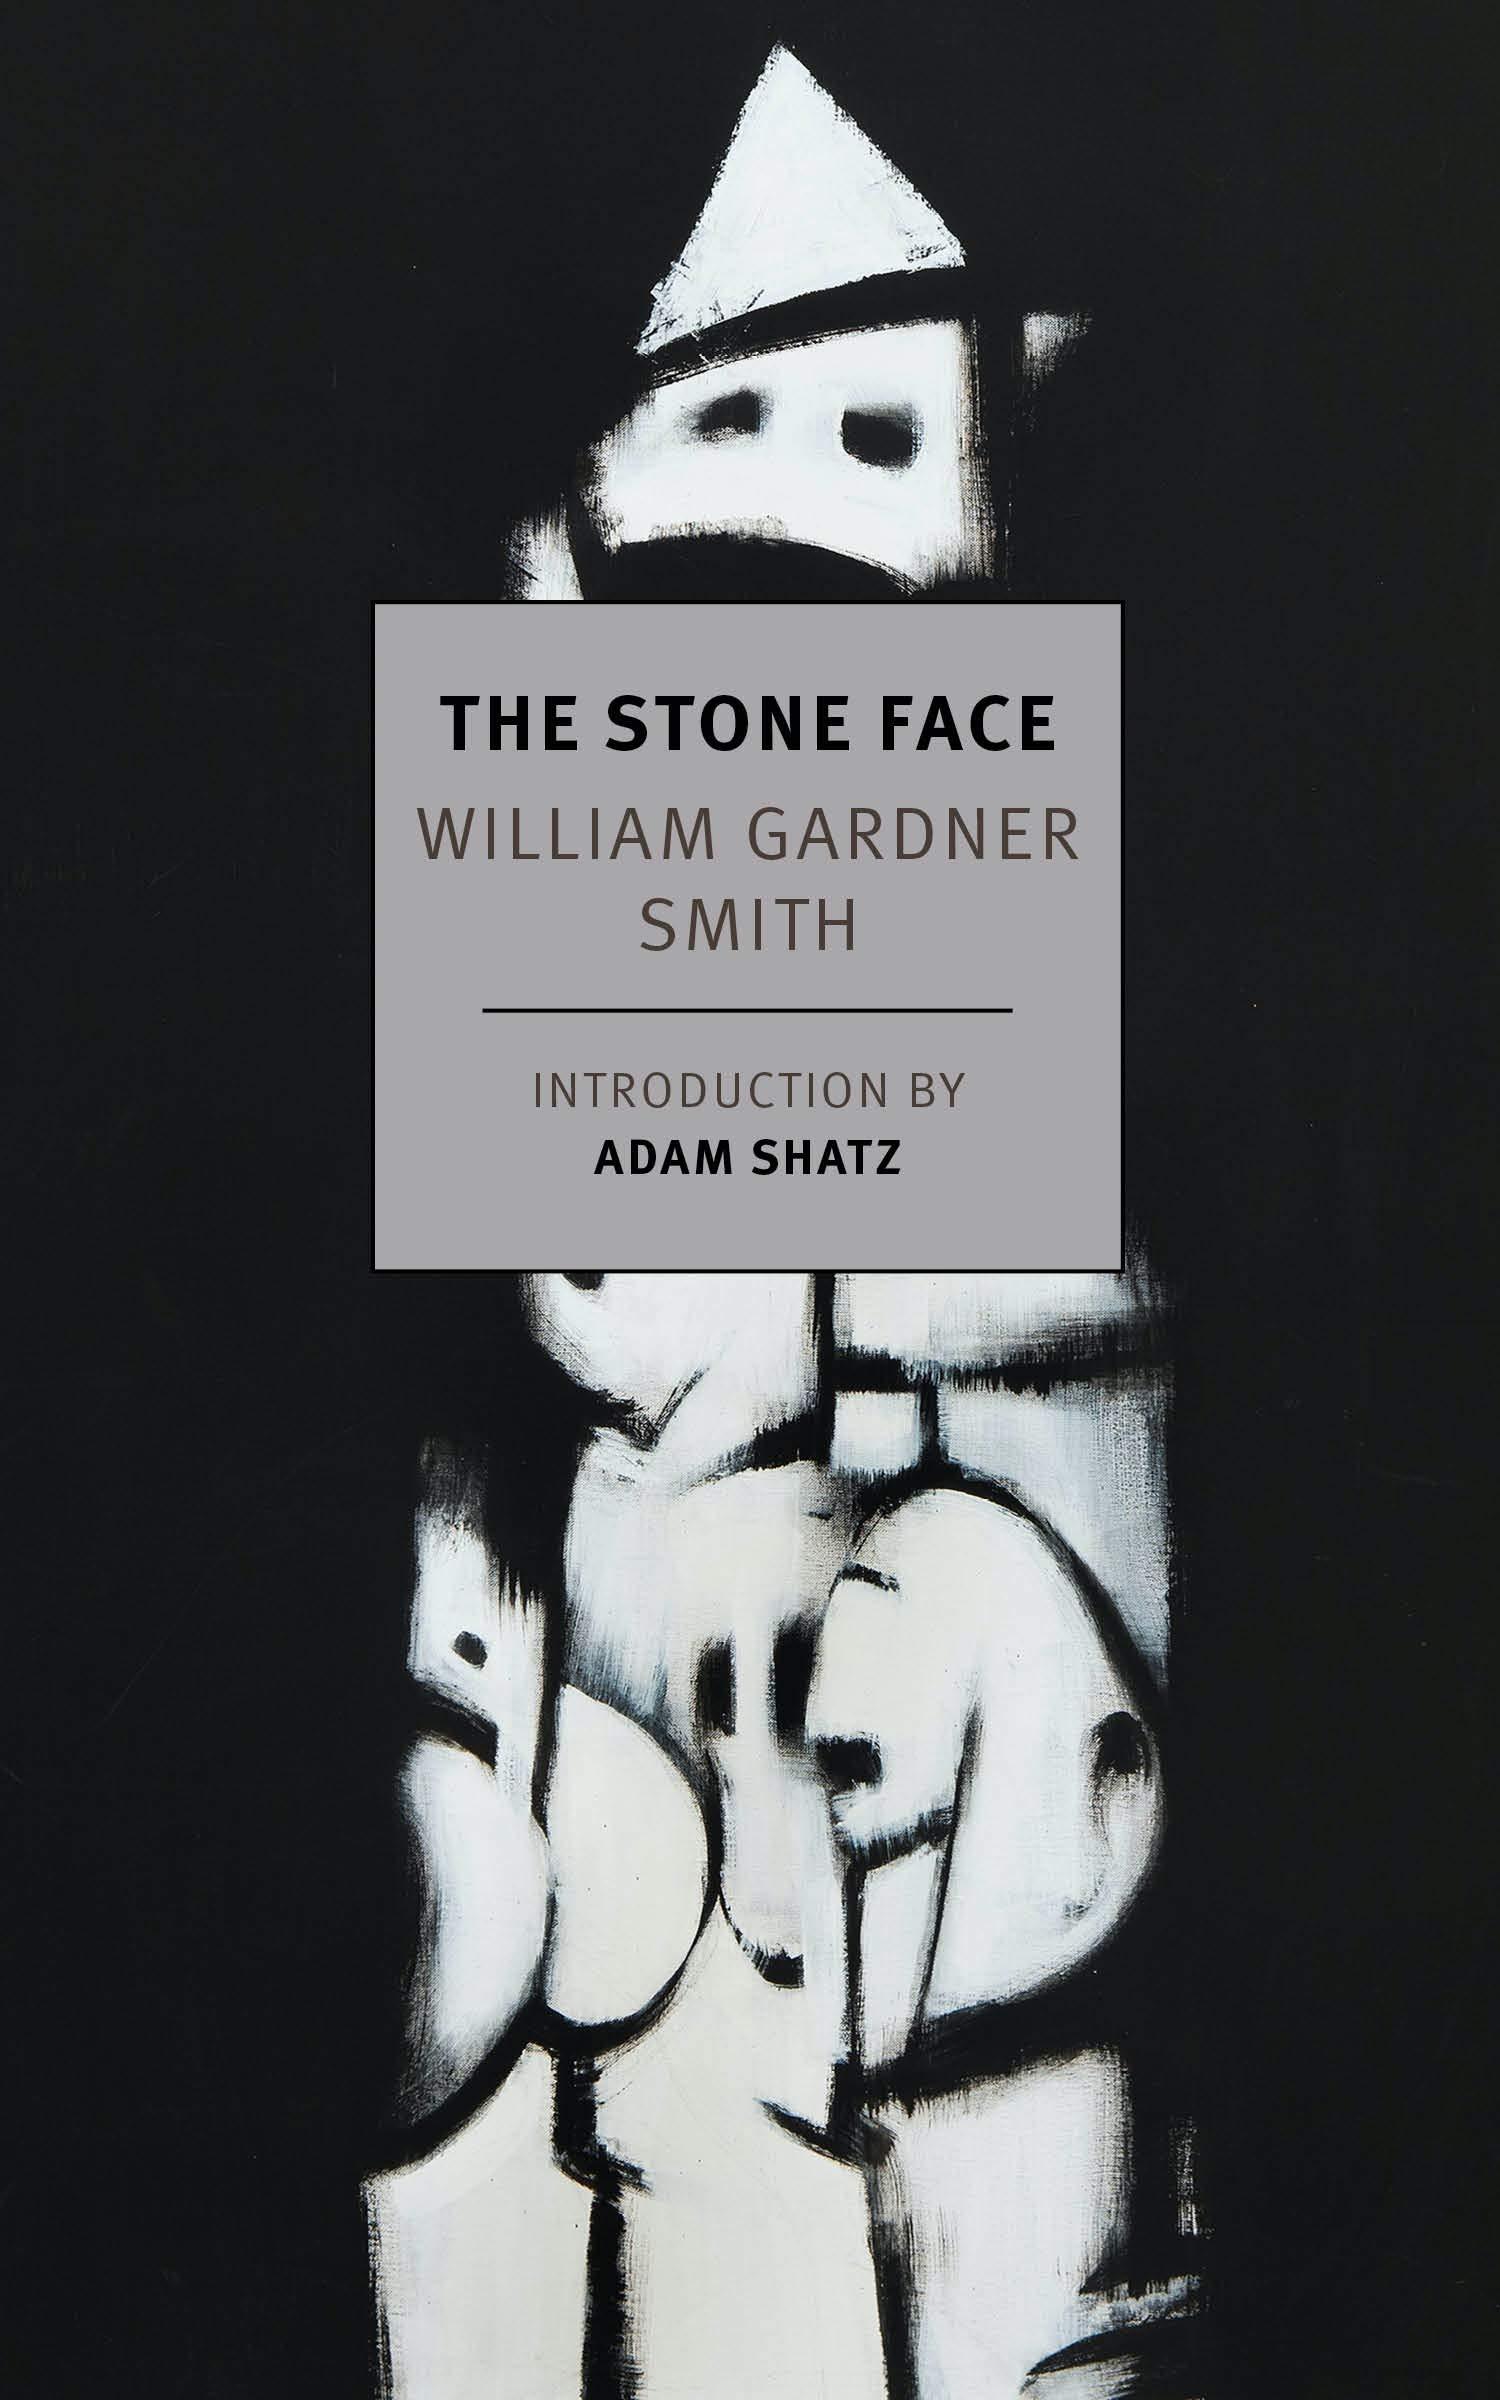 William Gardner Smith, The Stone Face